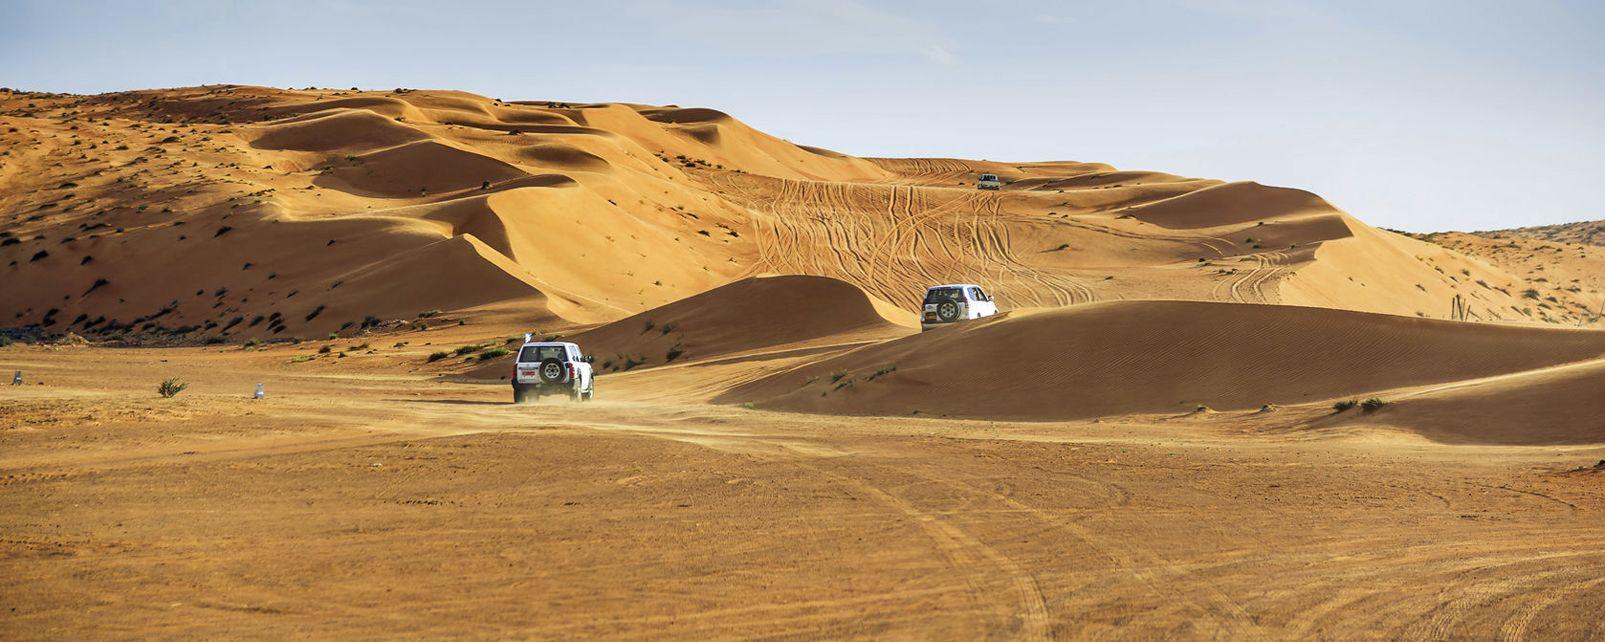 Les paysages, wahiba, oman, desert, dune, 4X4, moyen-orient